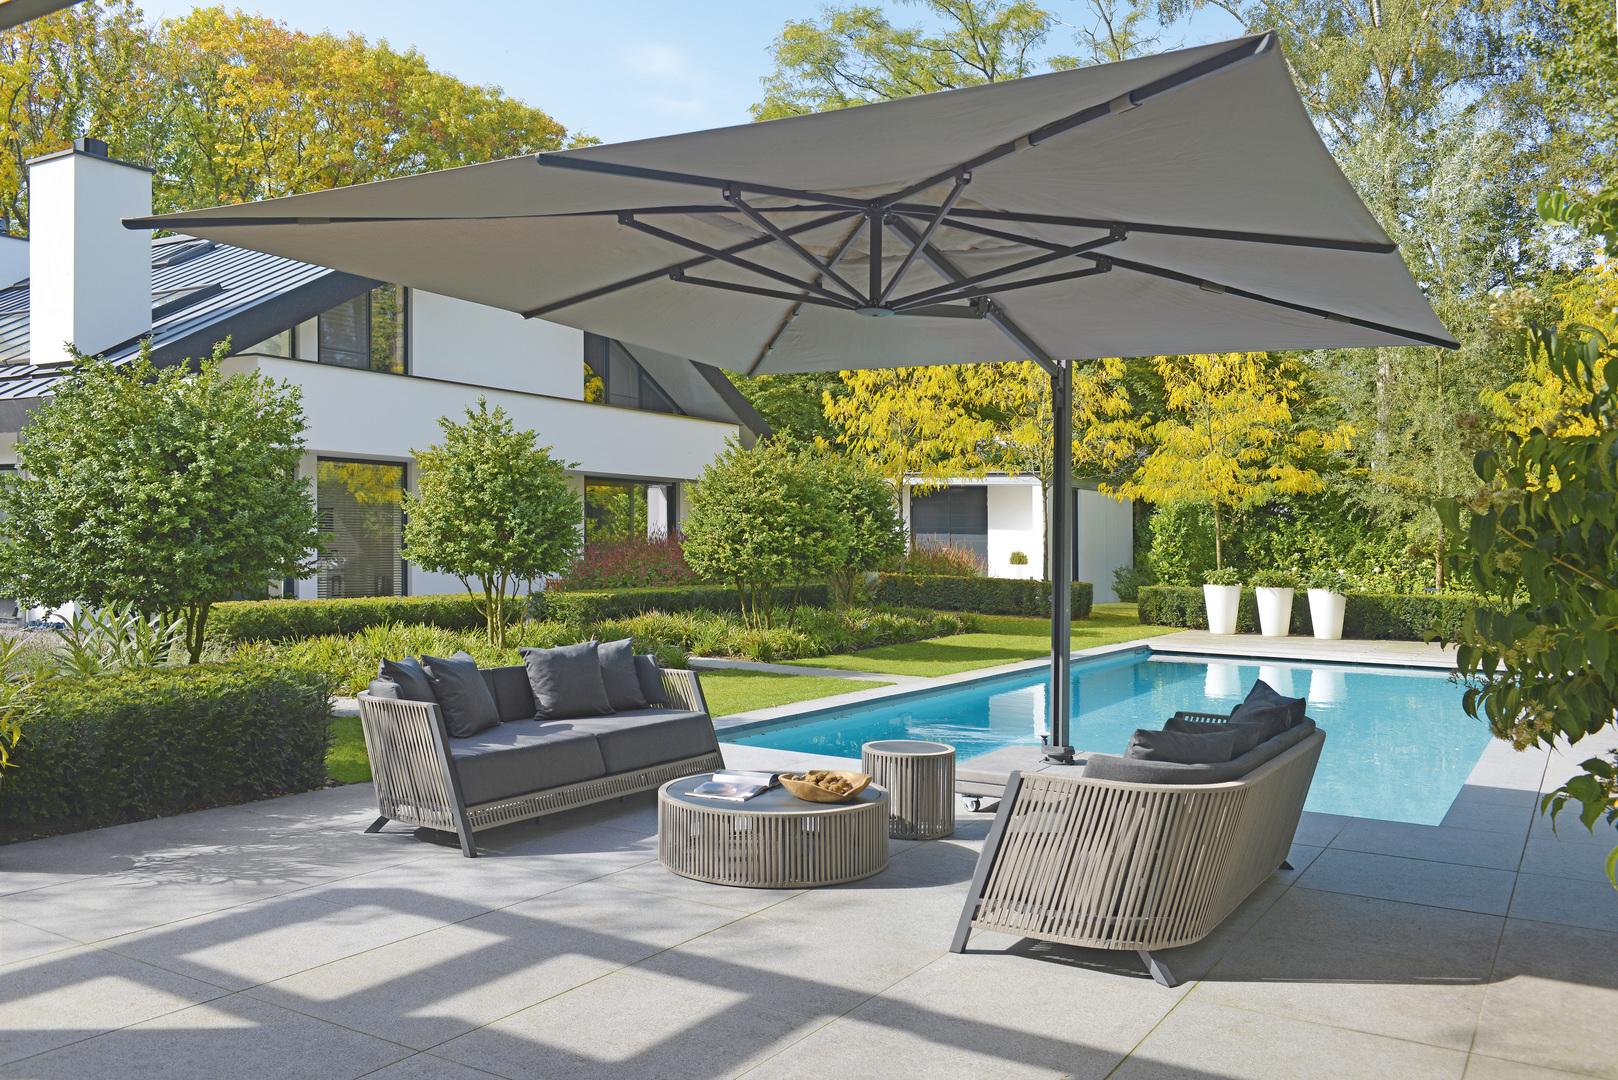 2018 Borek belt Cosenza sofa, coffee table & side table Wolterinck - parasol Porto 4x4.jpg